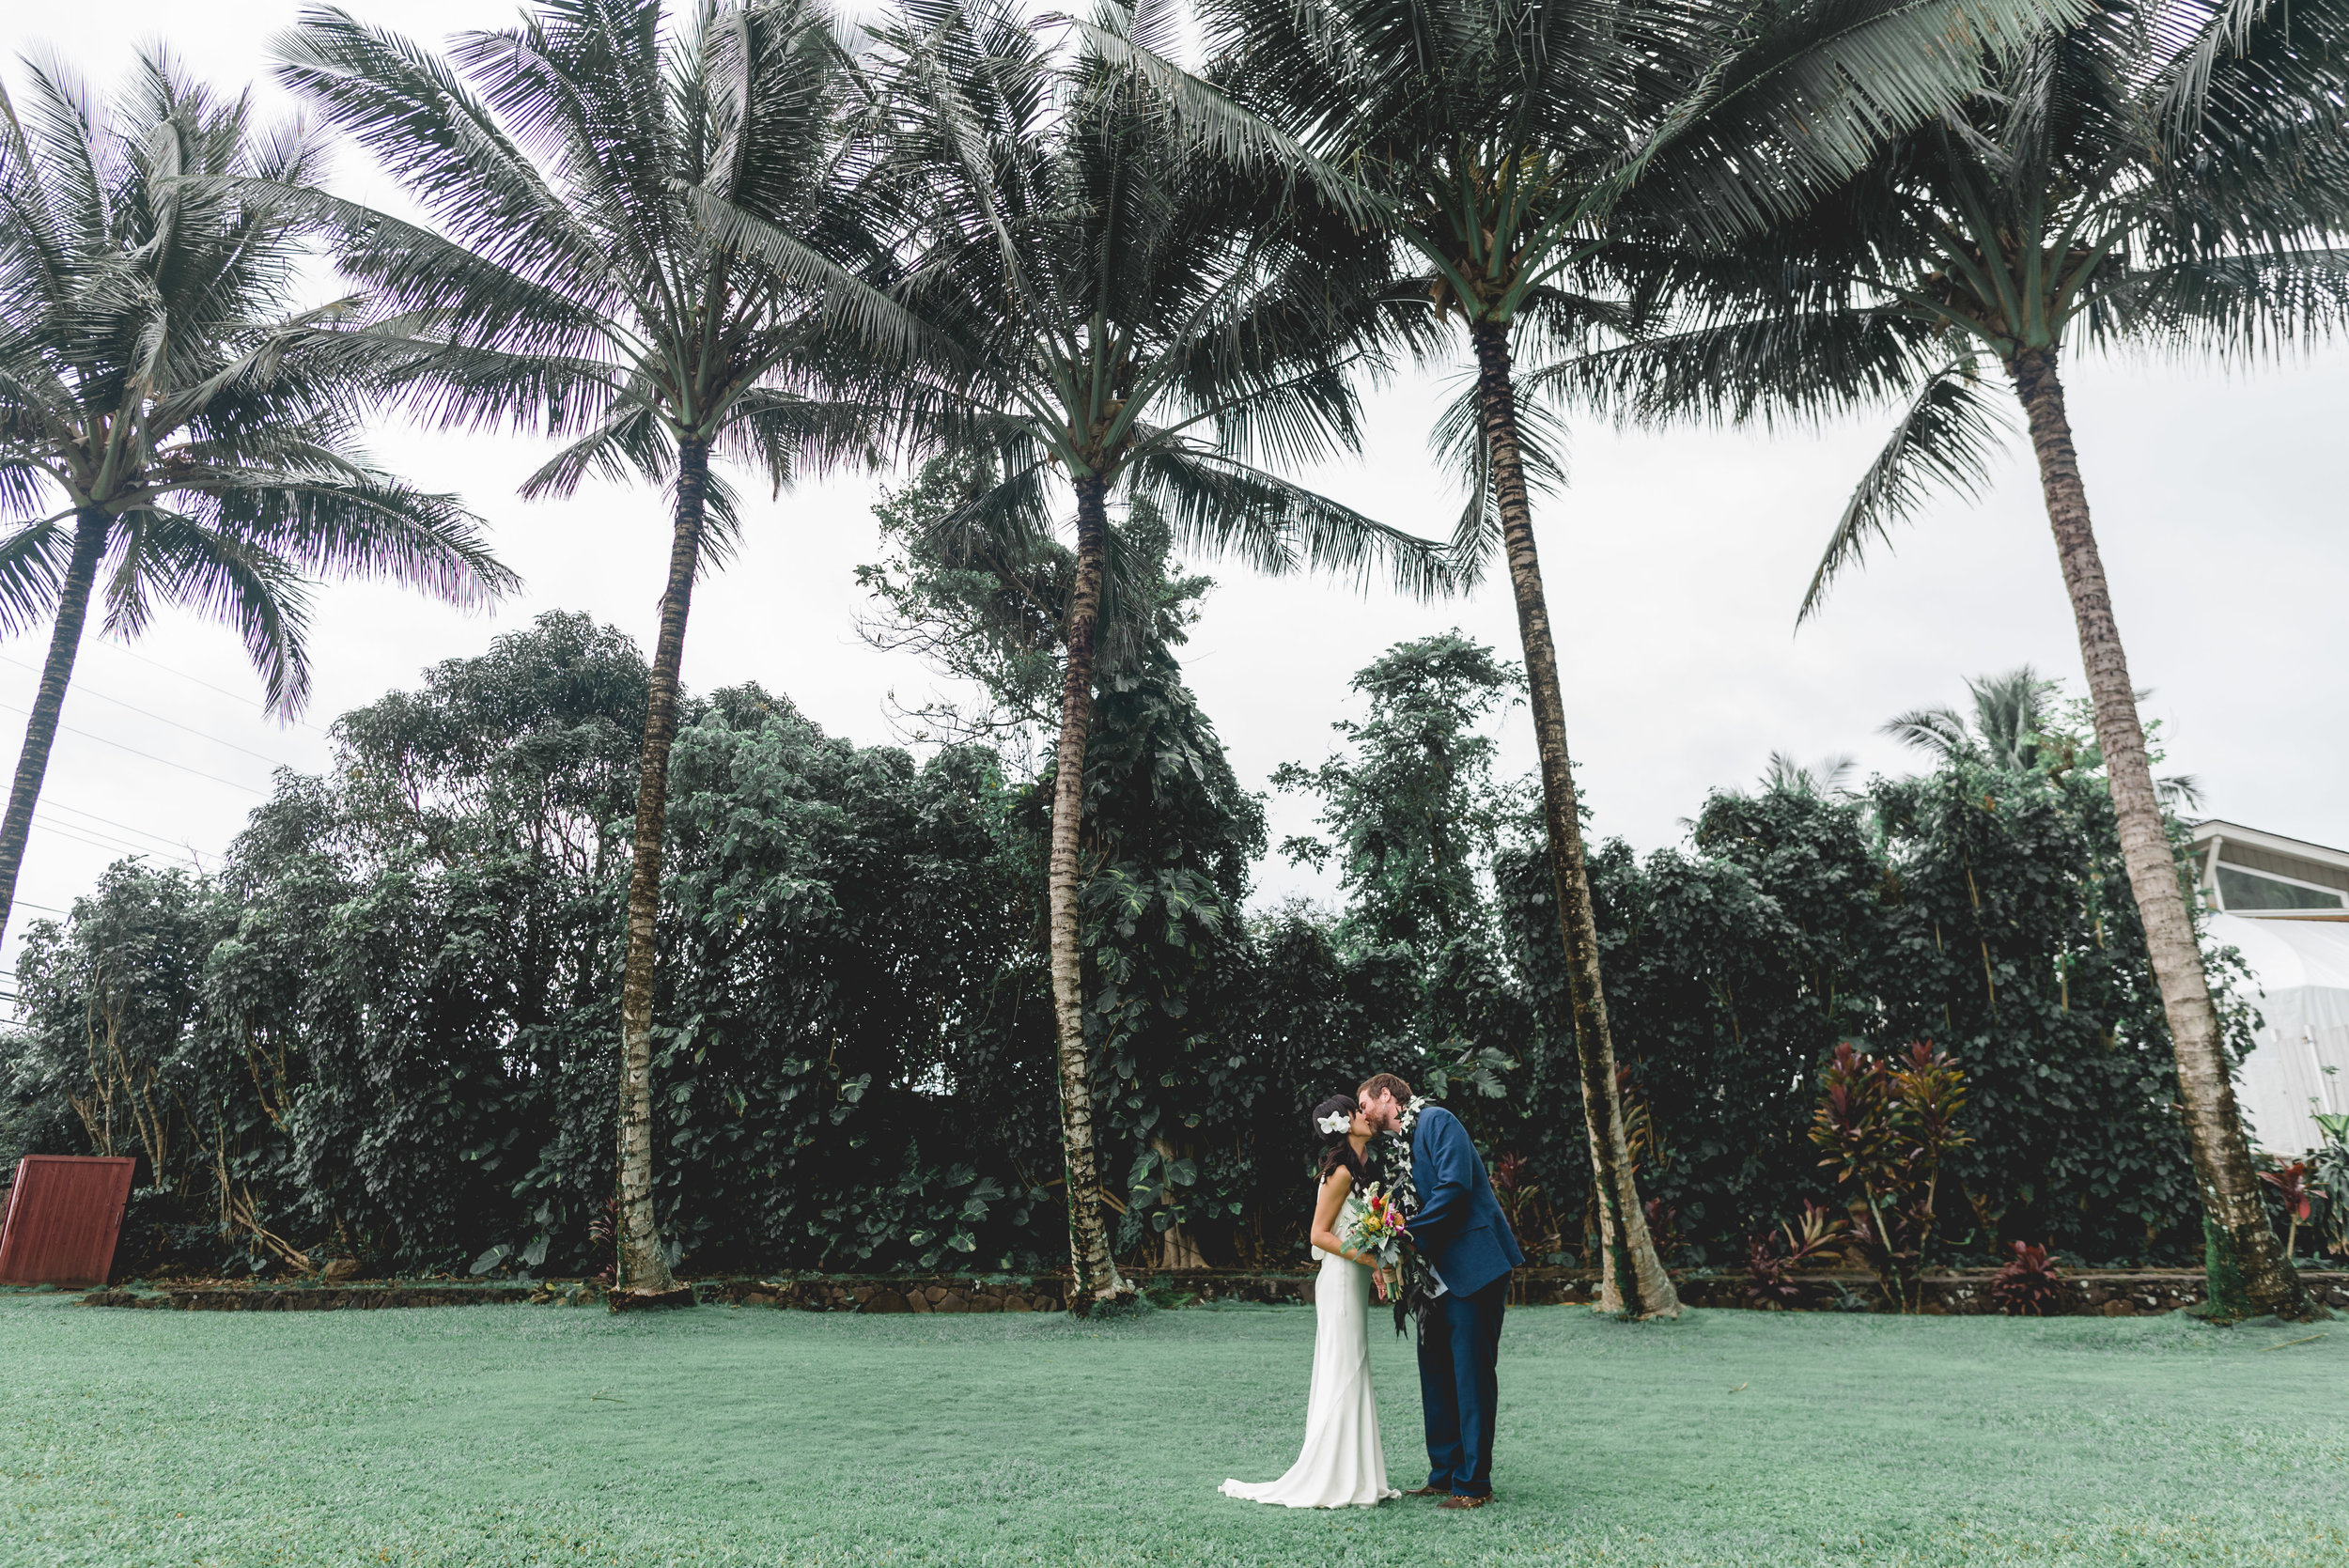 burns_deruntz-wedding-couple-51.jpg